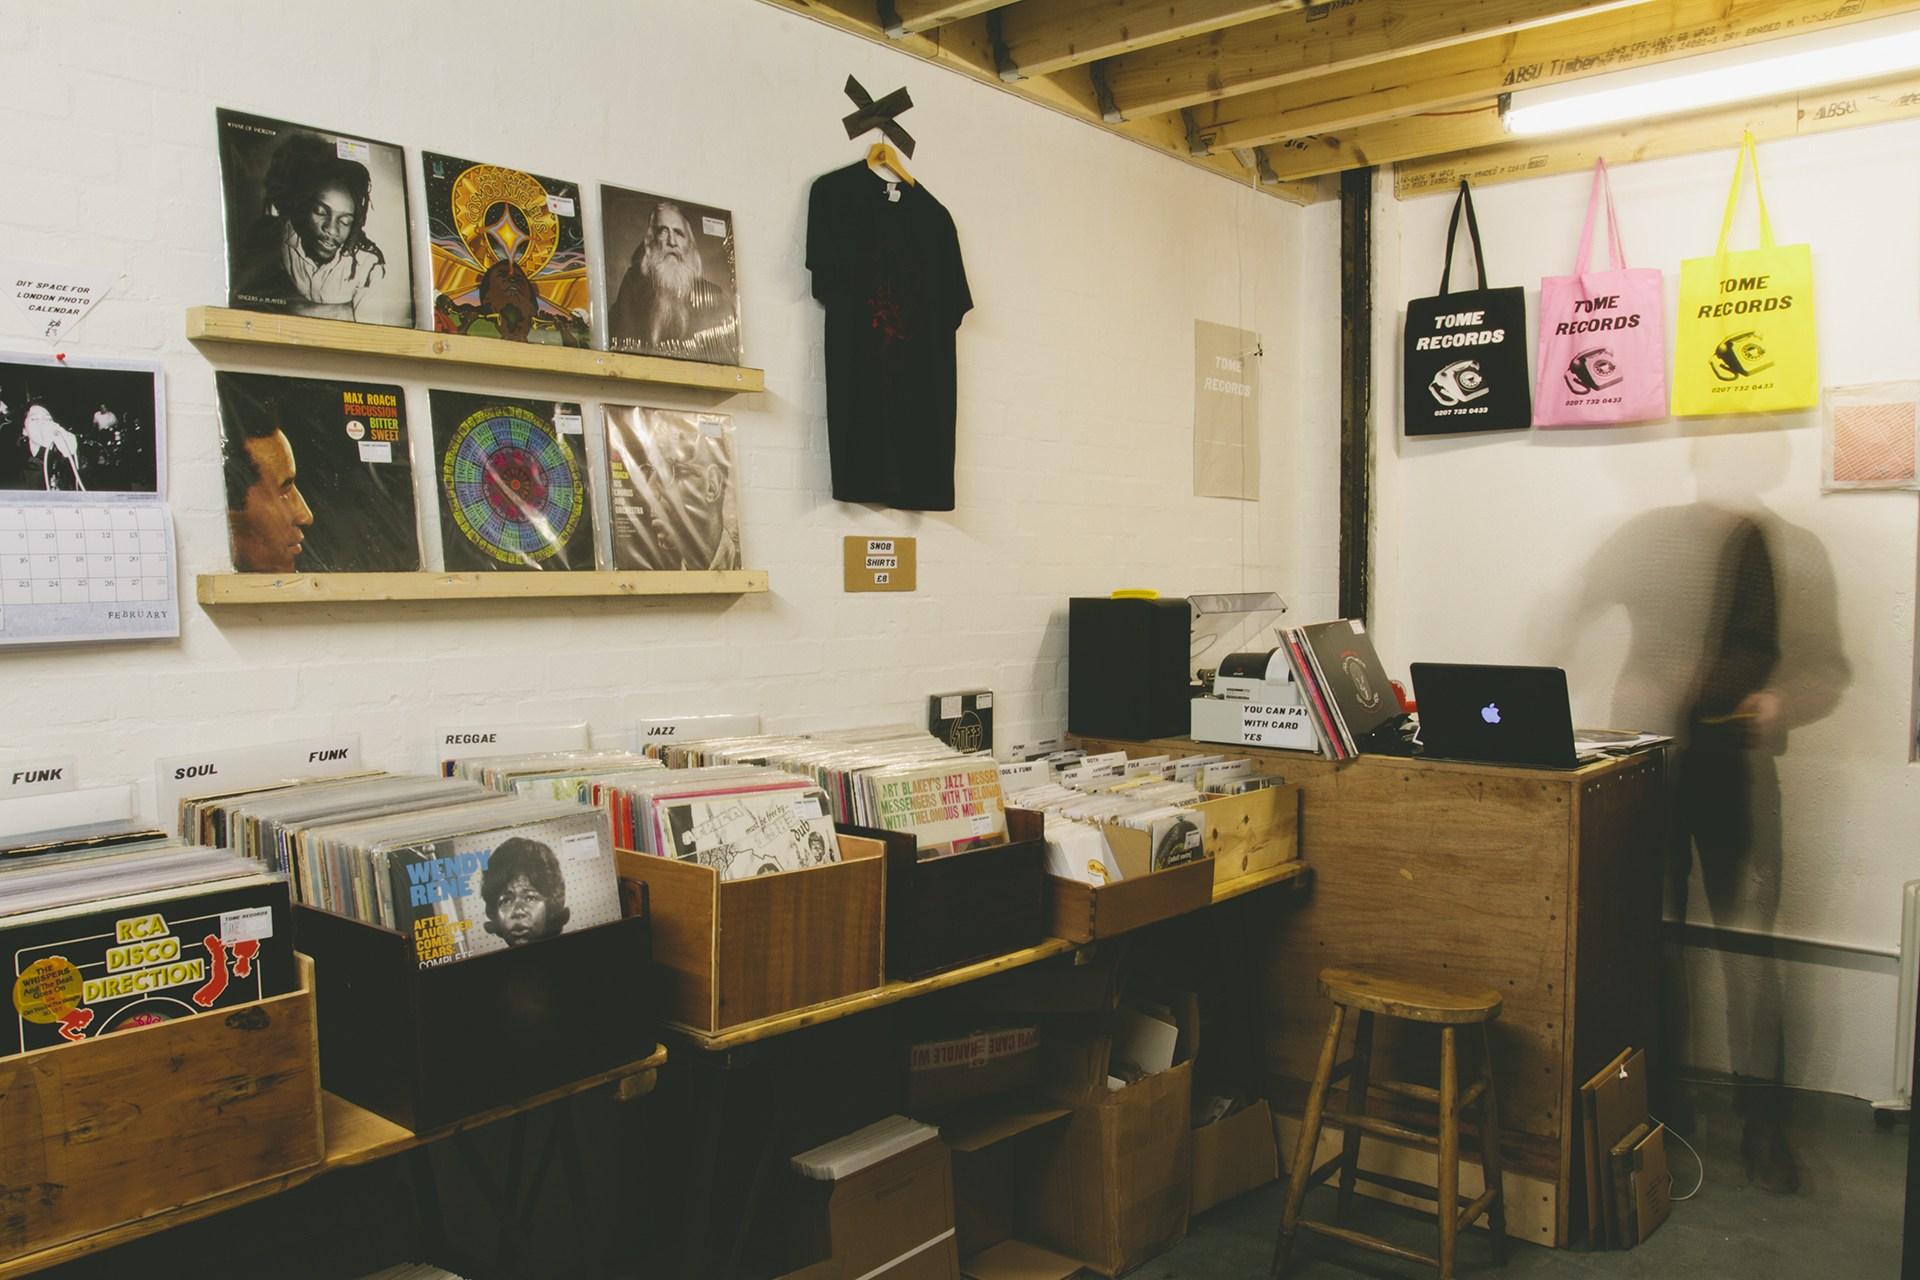 south-london-club-tome-records.jpg